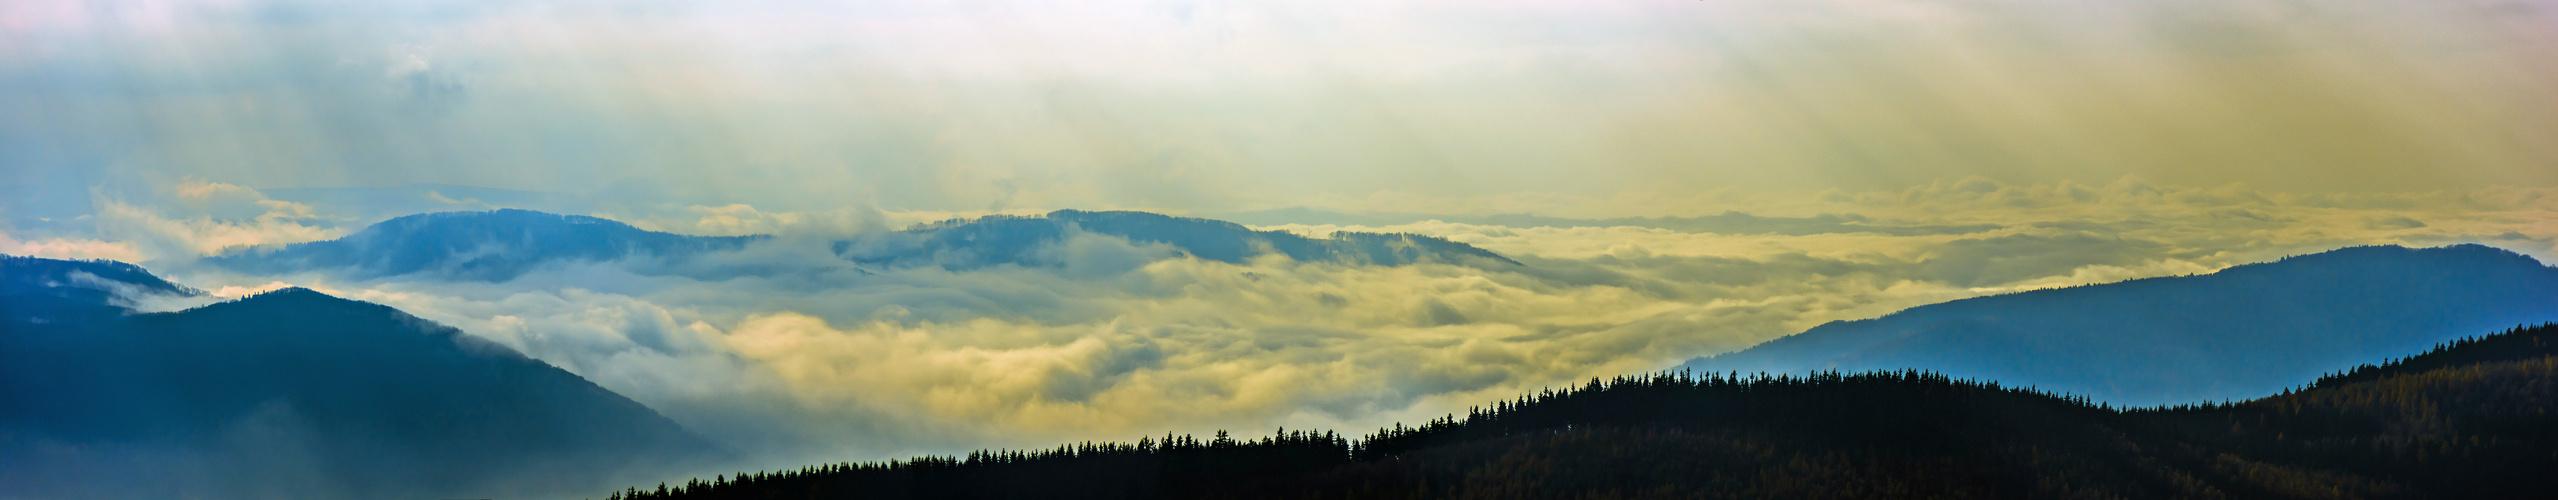 Nebelstimmung am Kupferberg